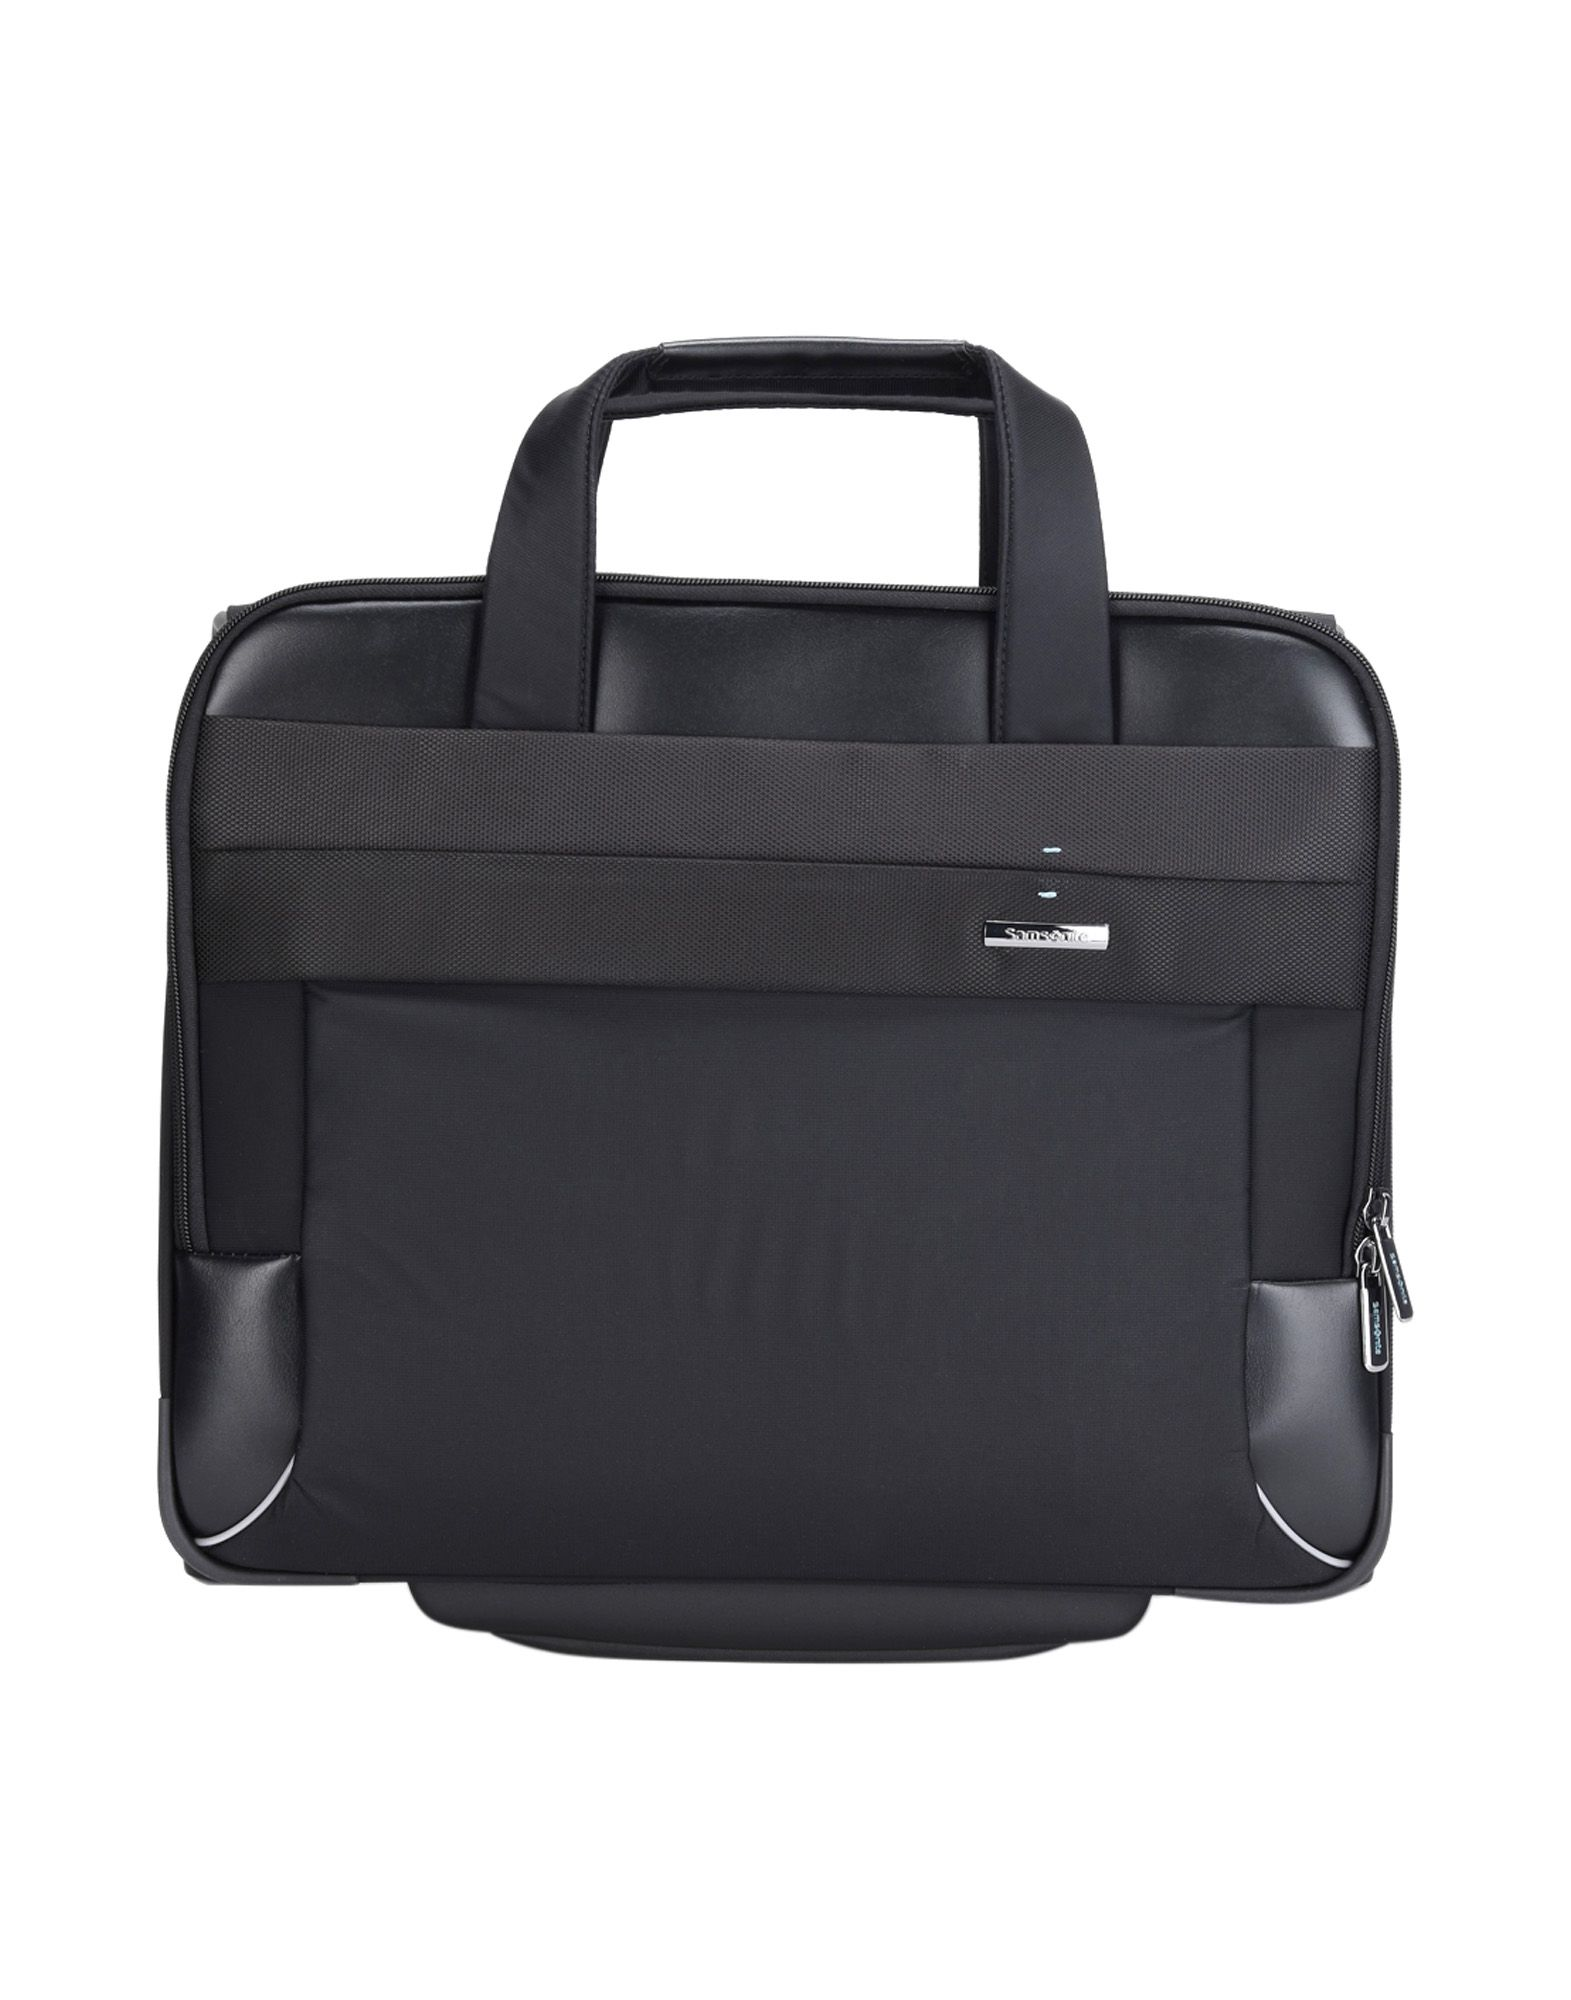 Trolley E Valigie Samsonite Spectrolite 2.0 Office Case/Wh 15.6 Black - Uomo - Acquista online su